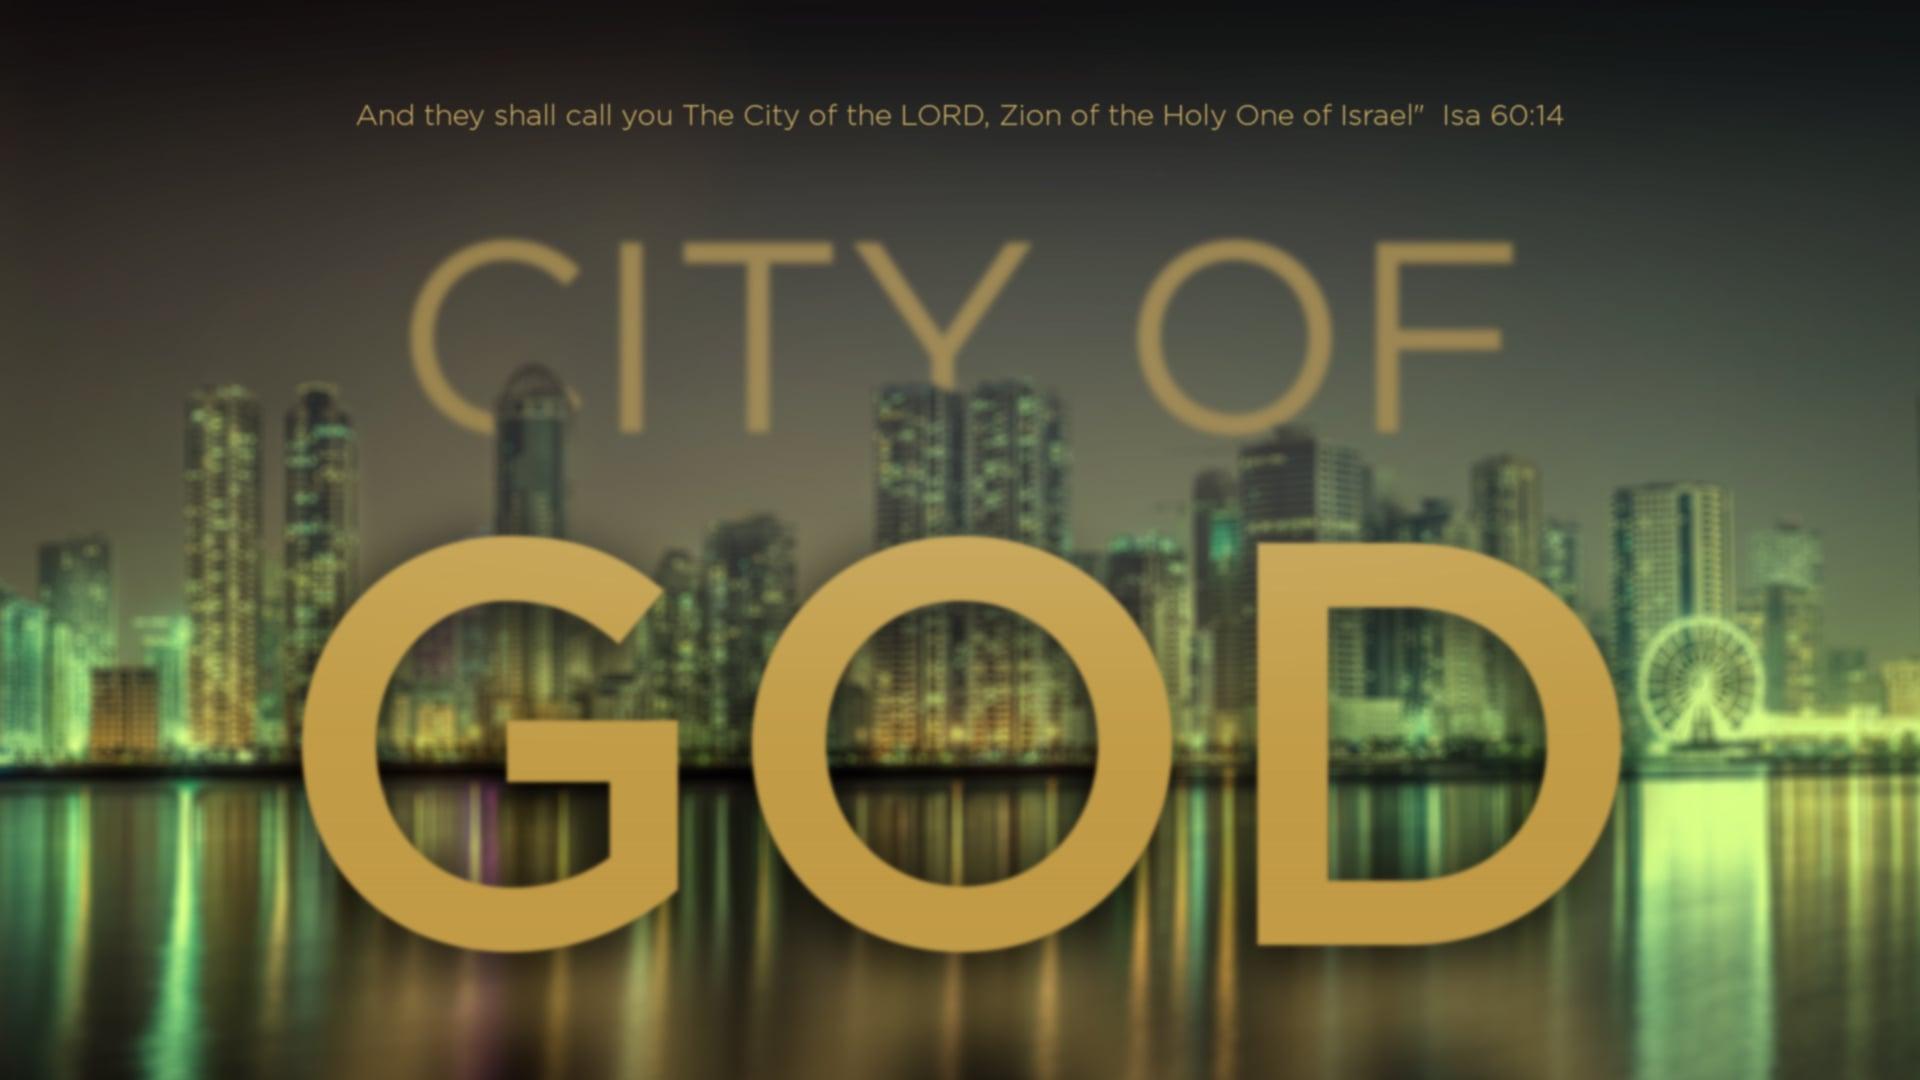 City of God - Part 2